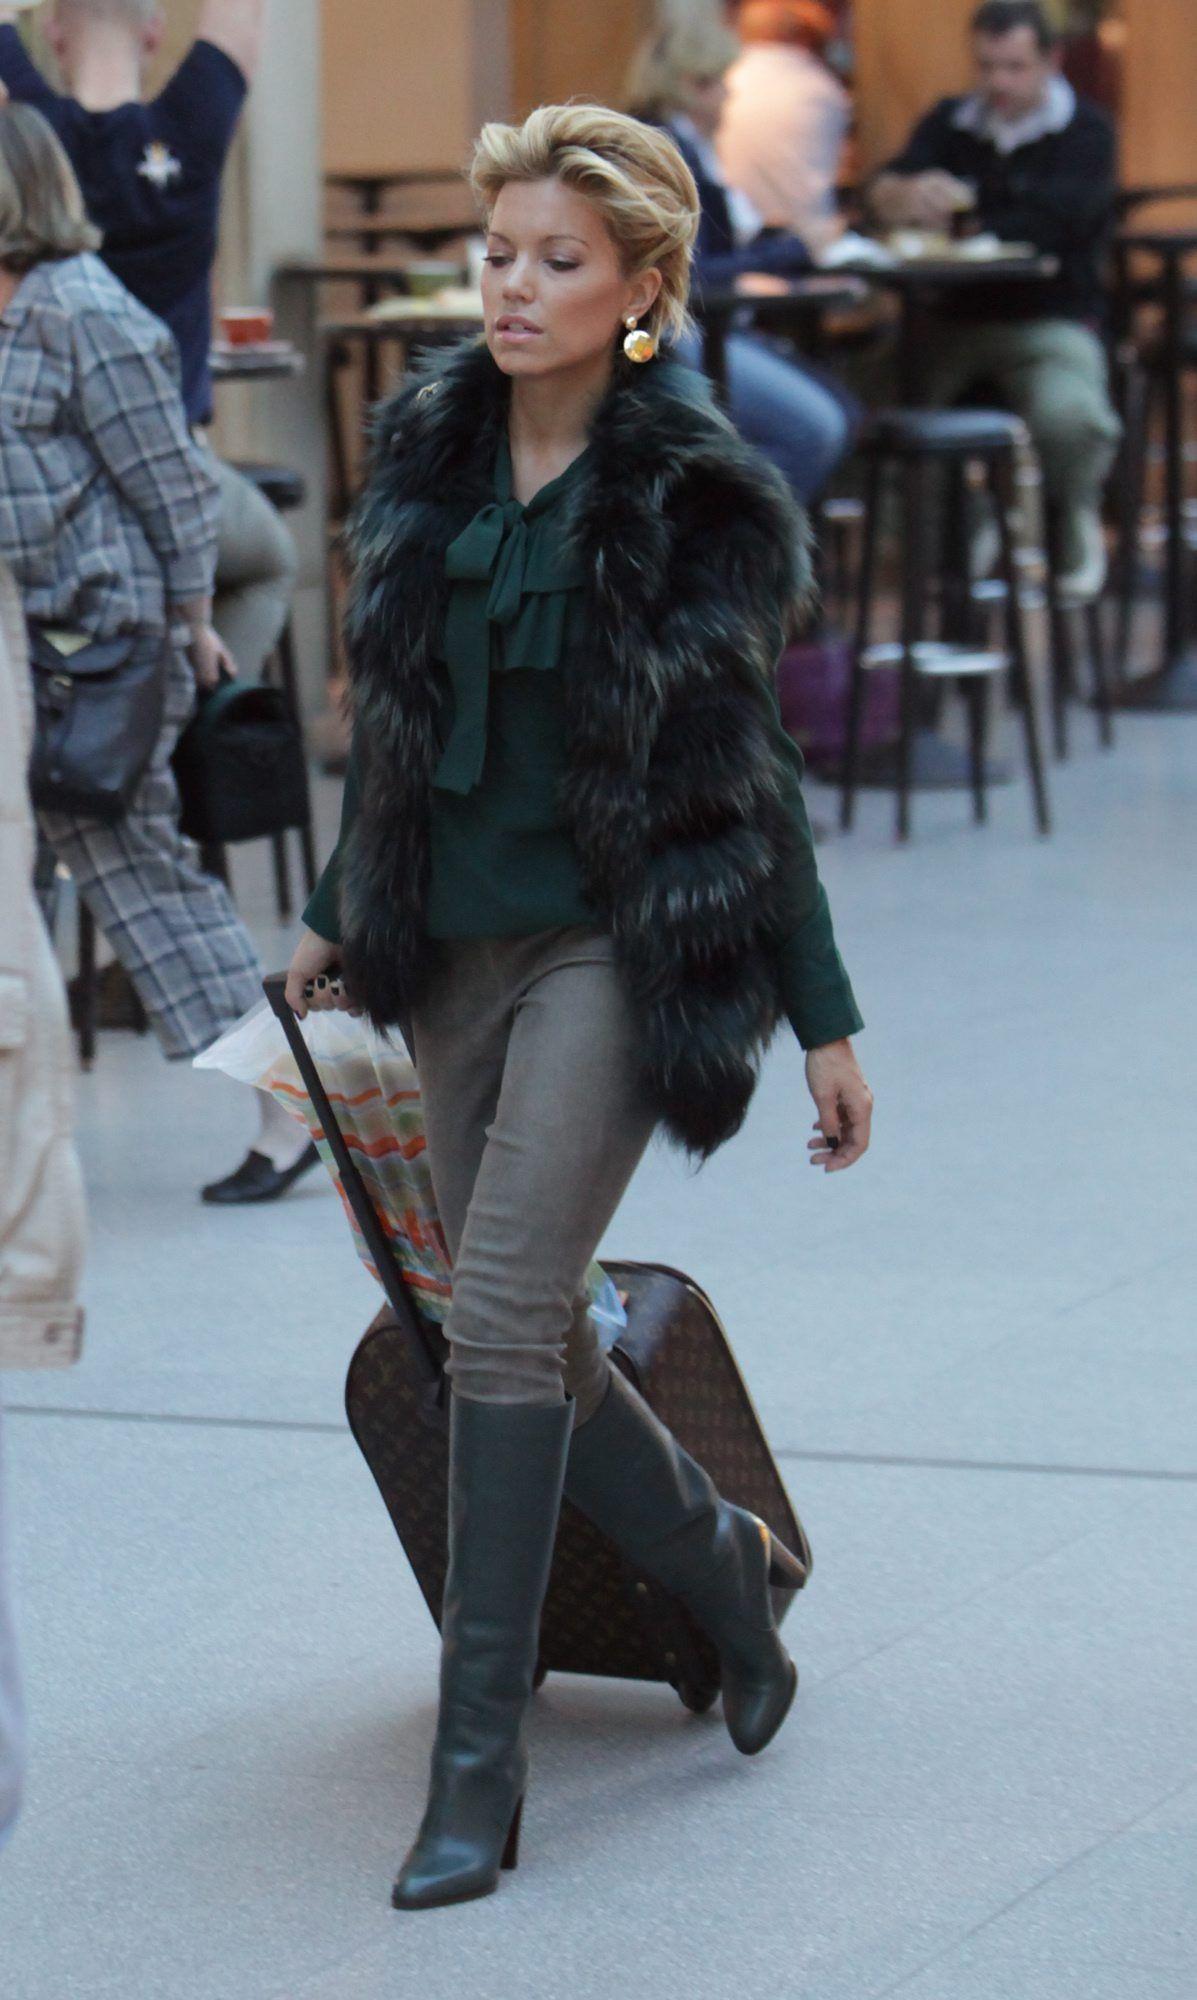 fashion style by Sylvie van der Vaart Loving this Chic